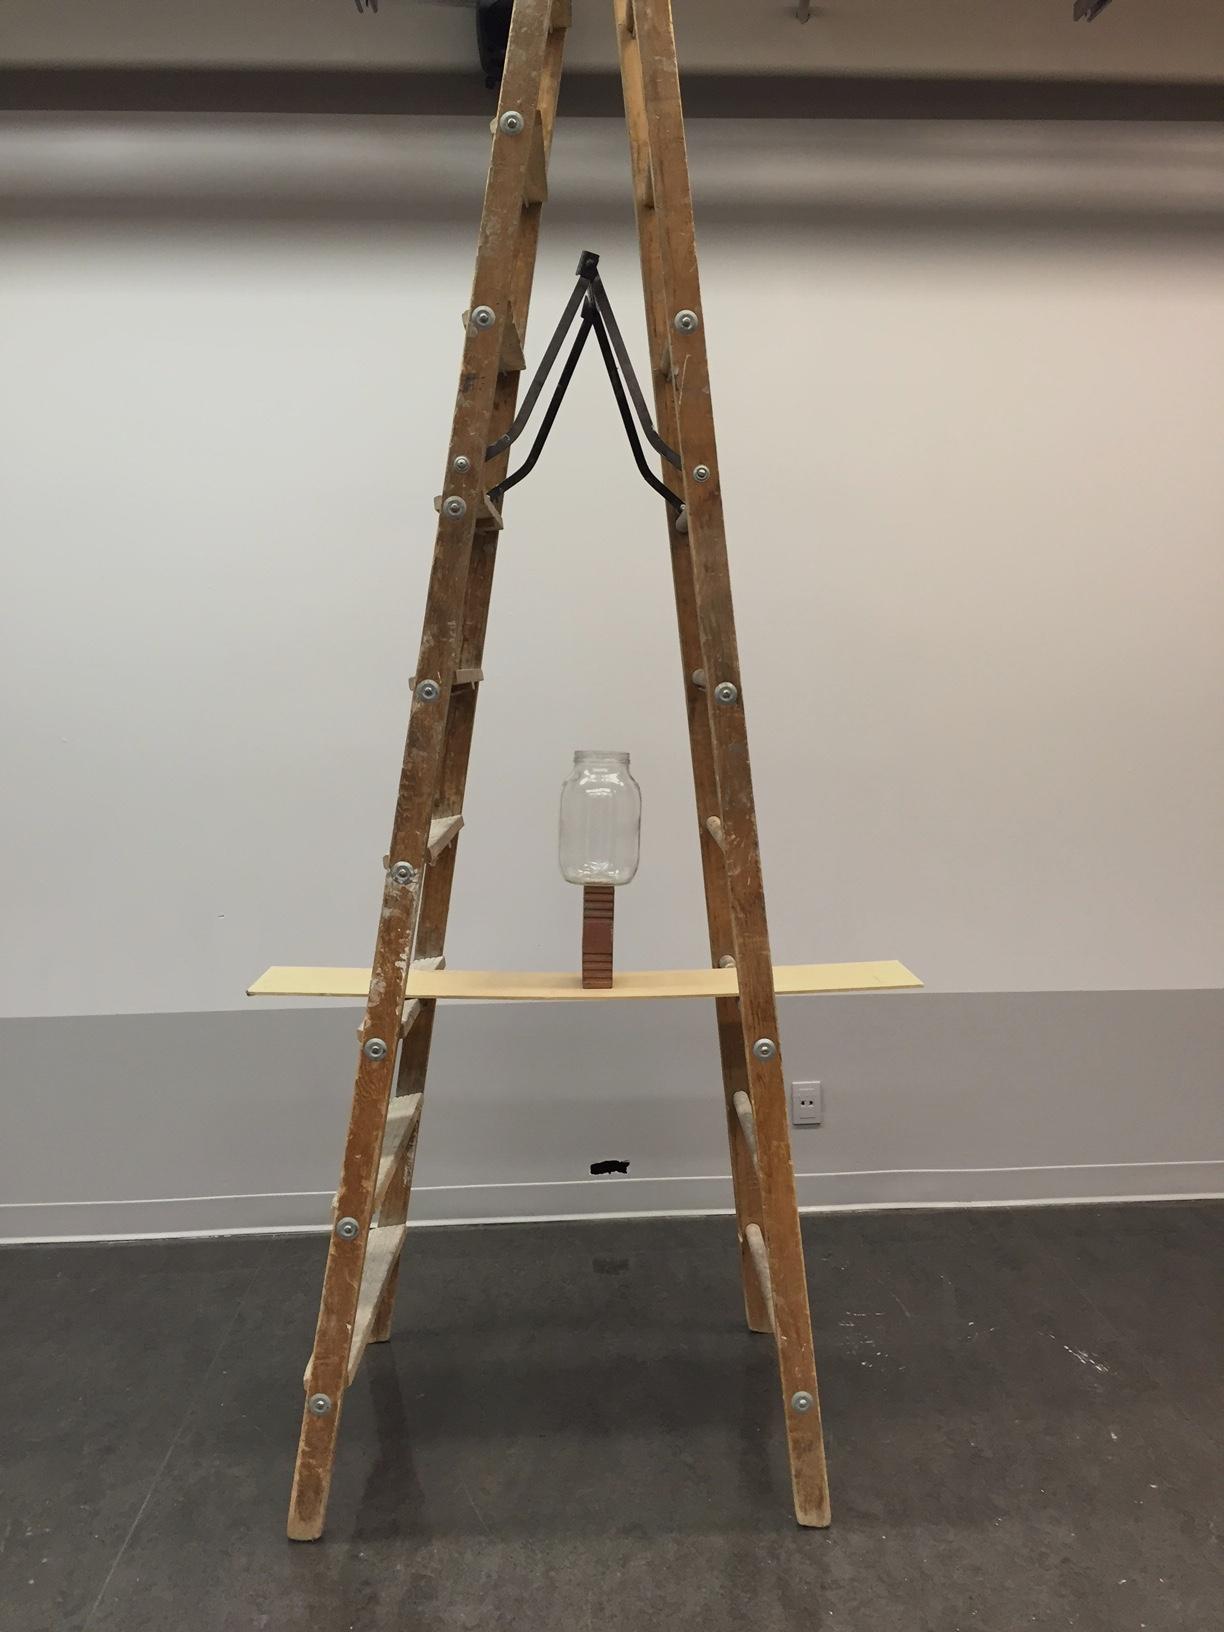 Ladder Posirions